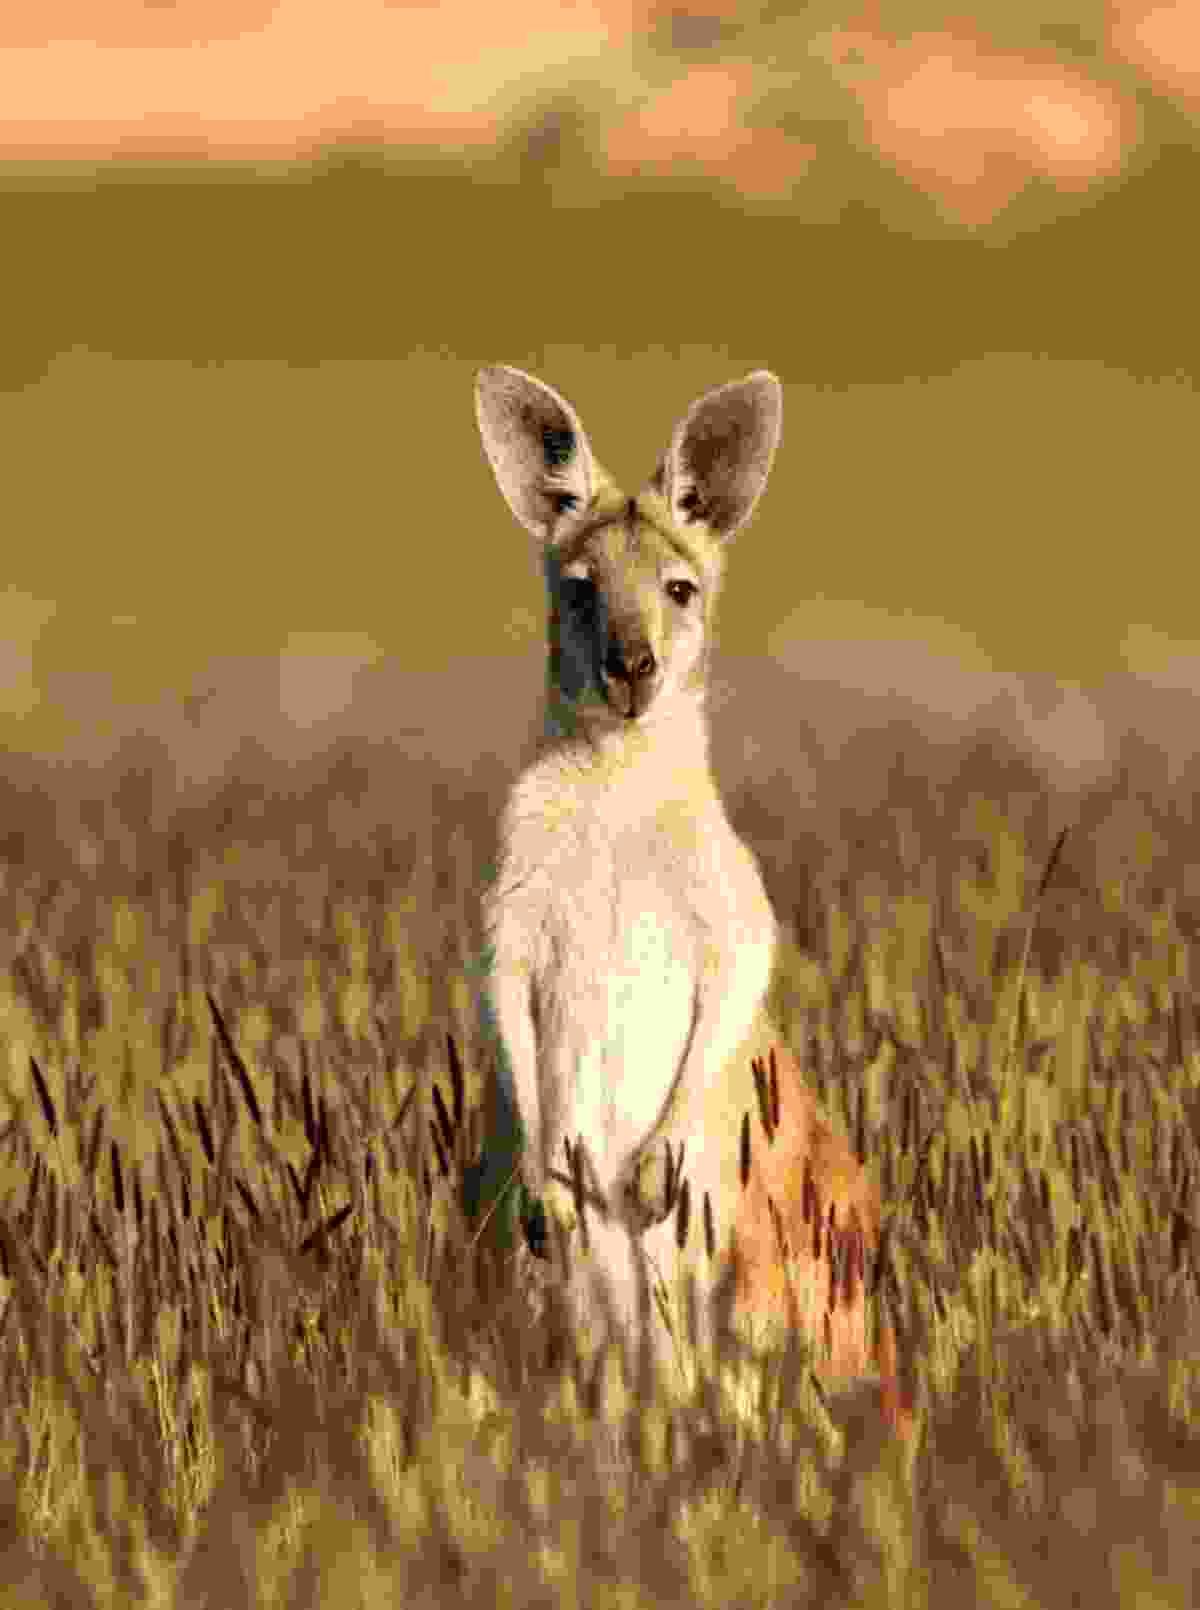 Kangaroo in the Australian outback (Dreamstime)